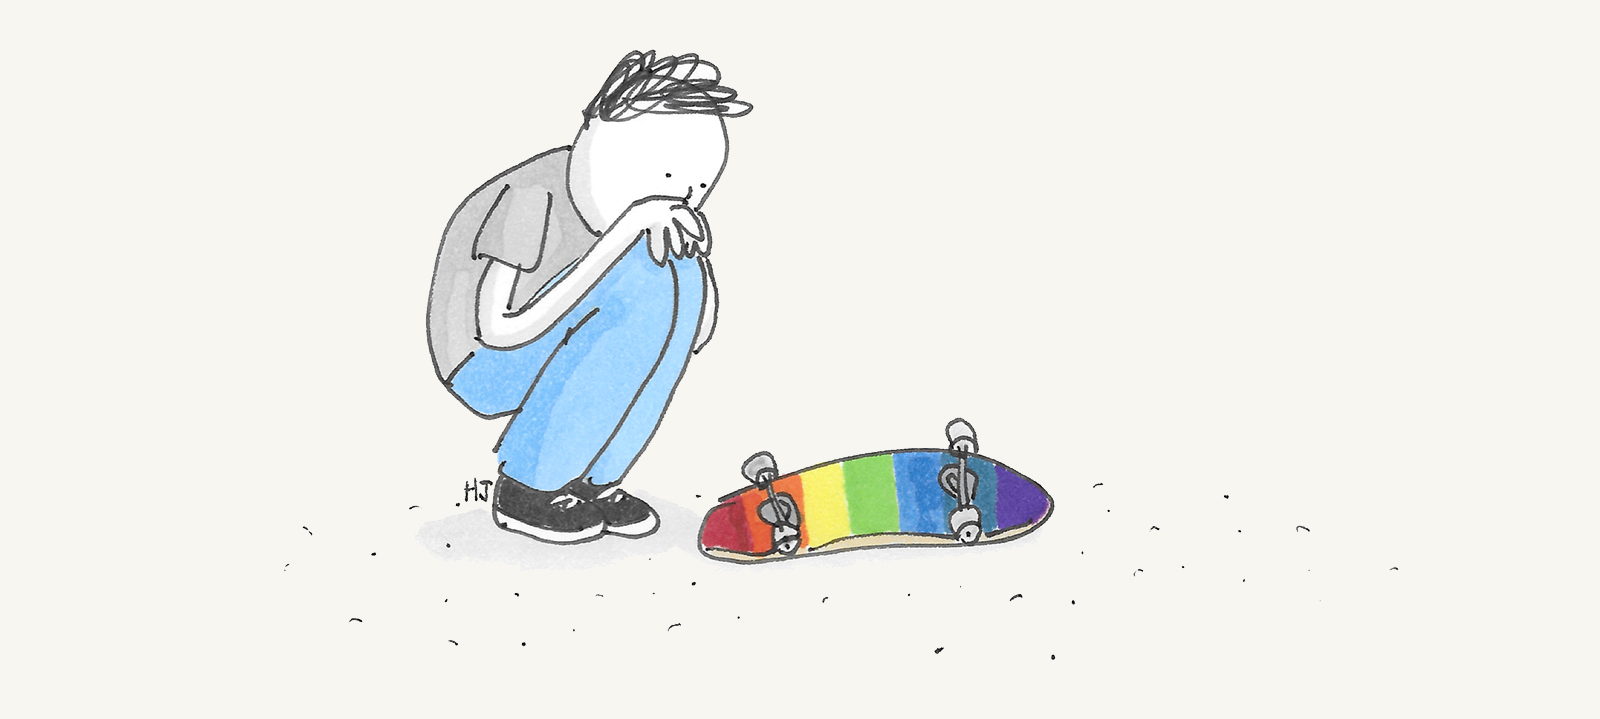 henry_jones_skateboarding_everyone_1